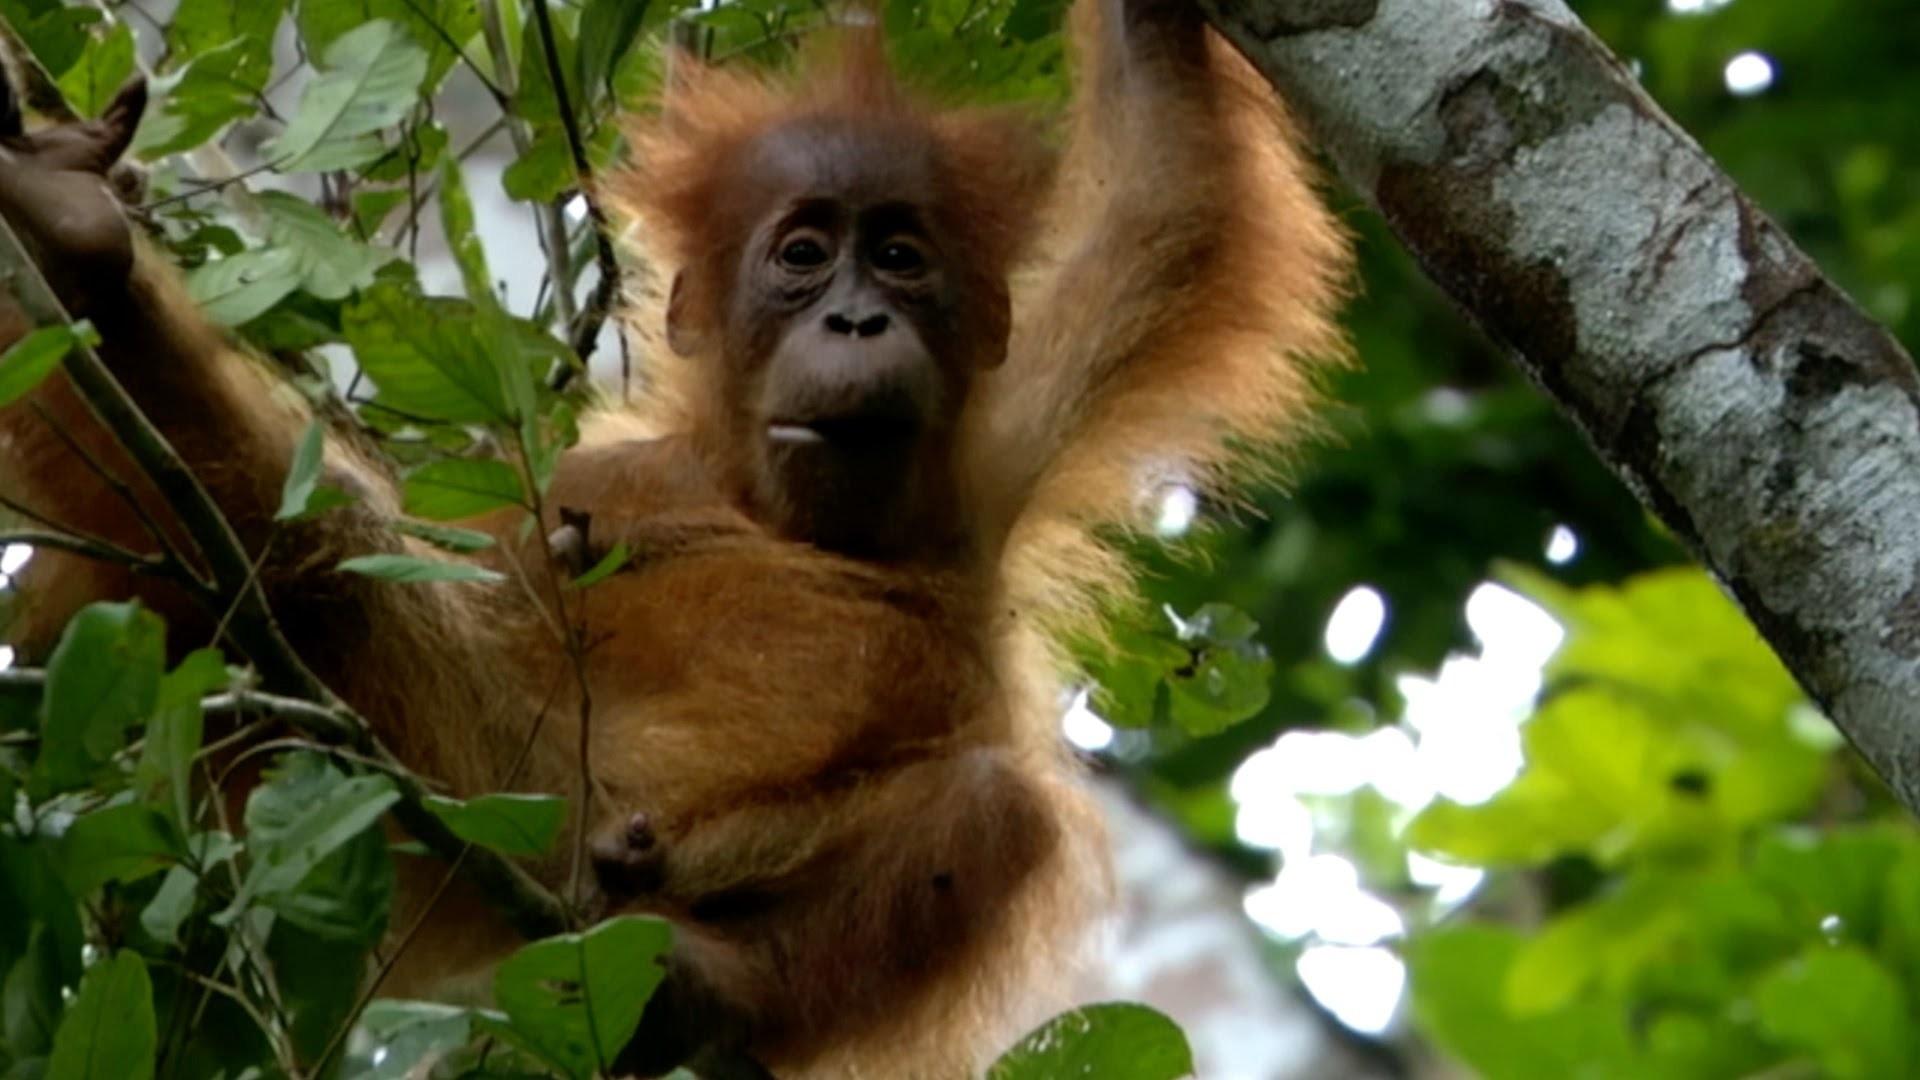 Baby Orangutan Wallpaper 64 Images